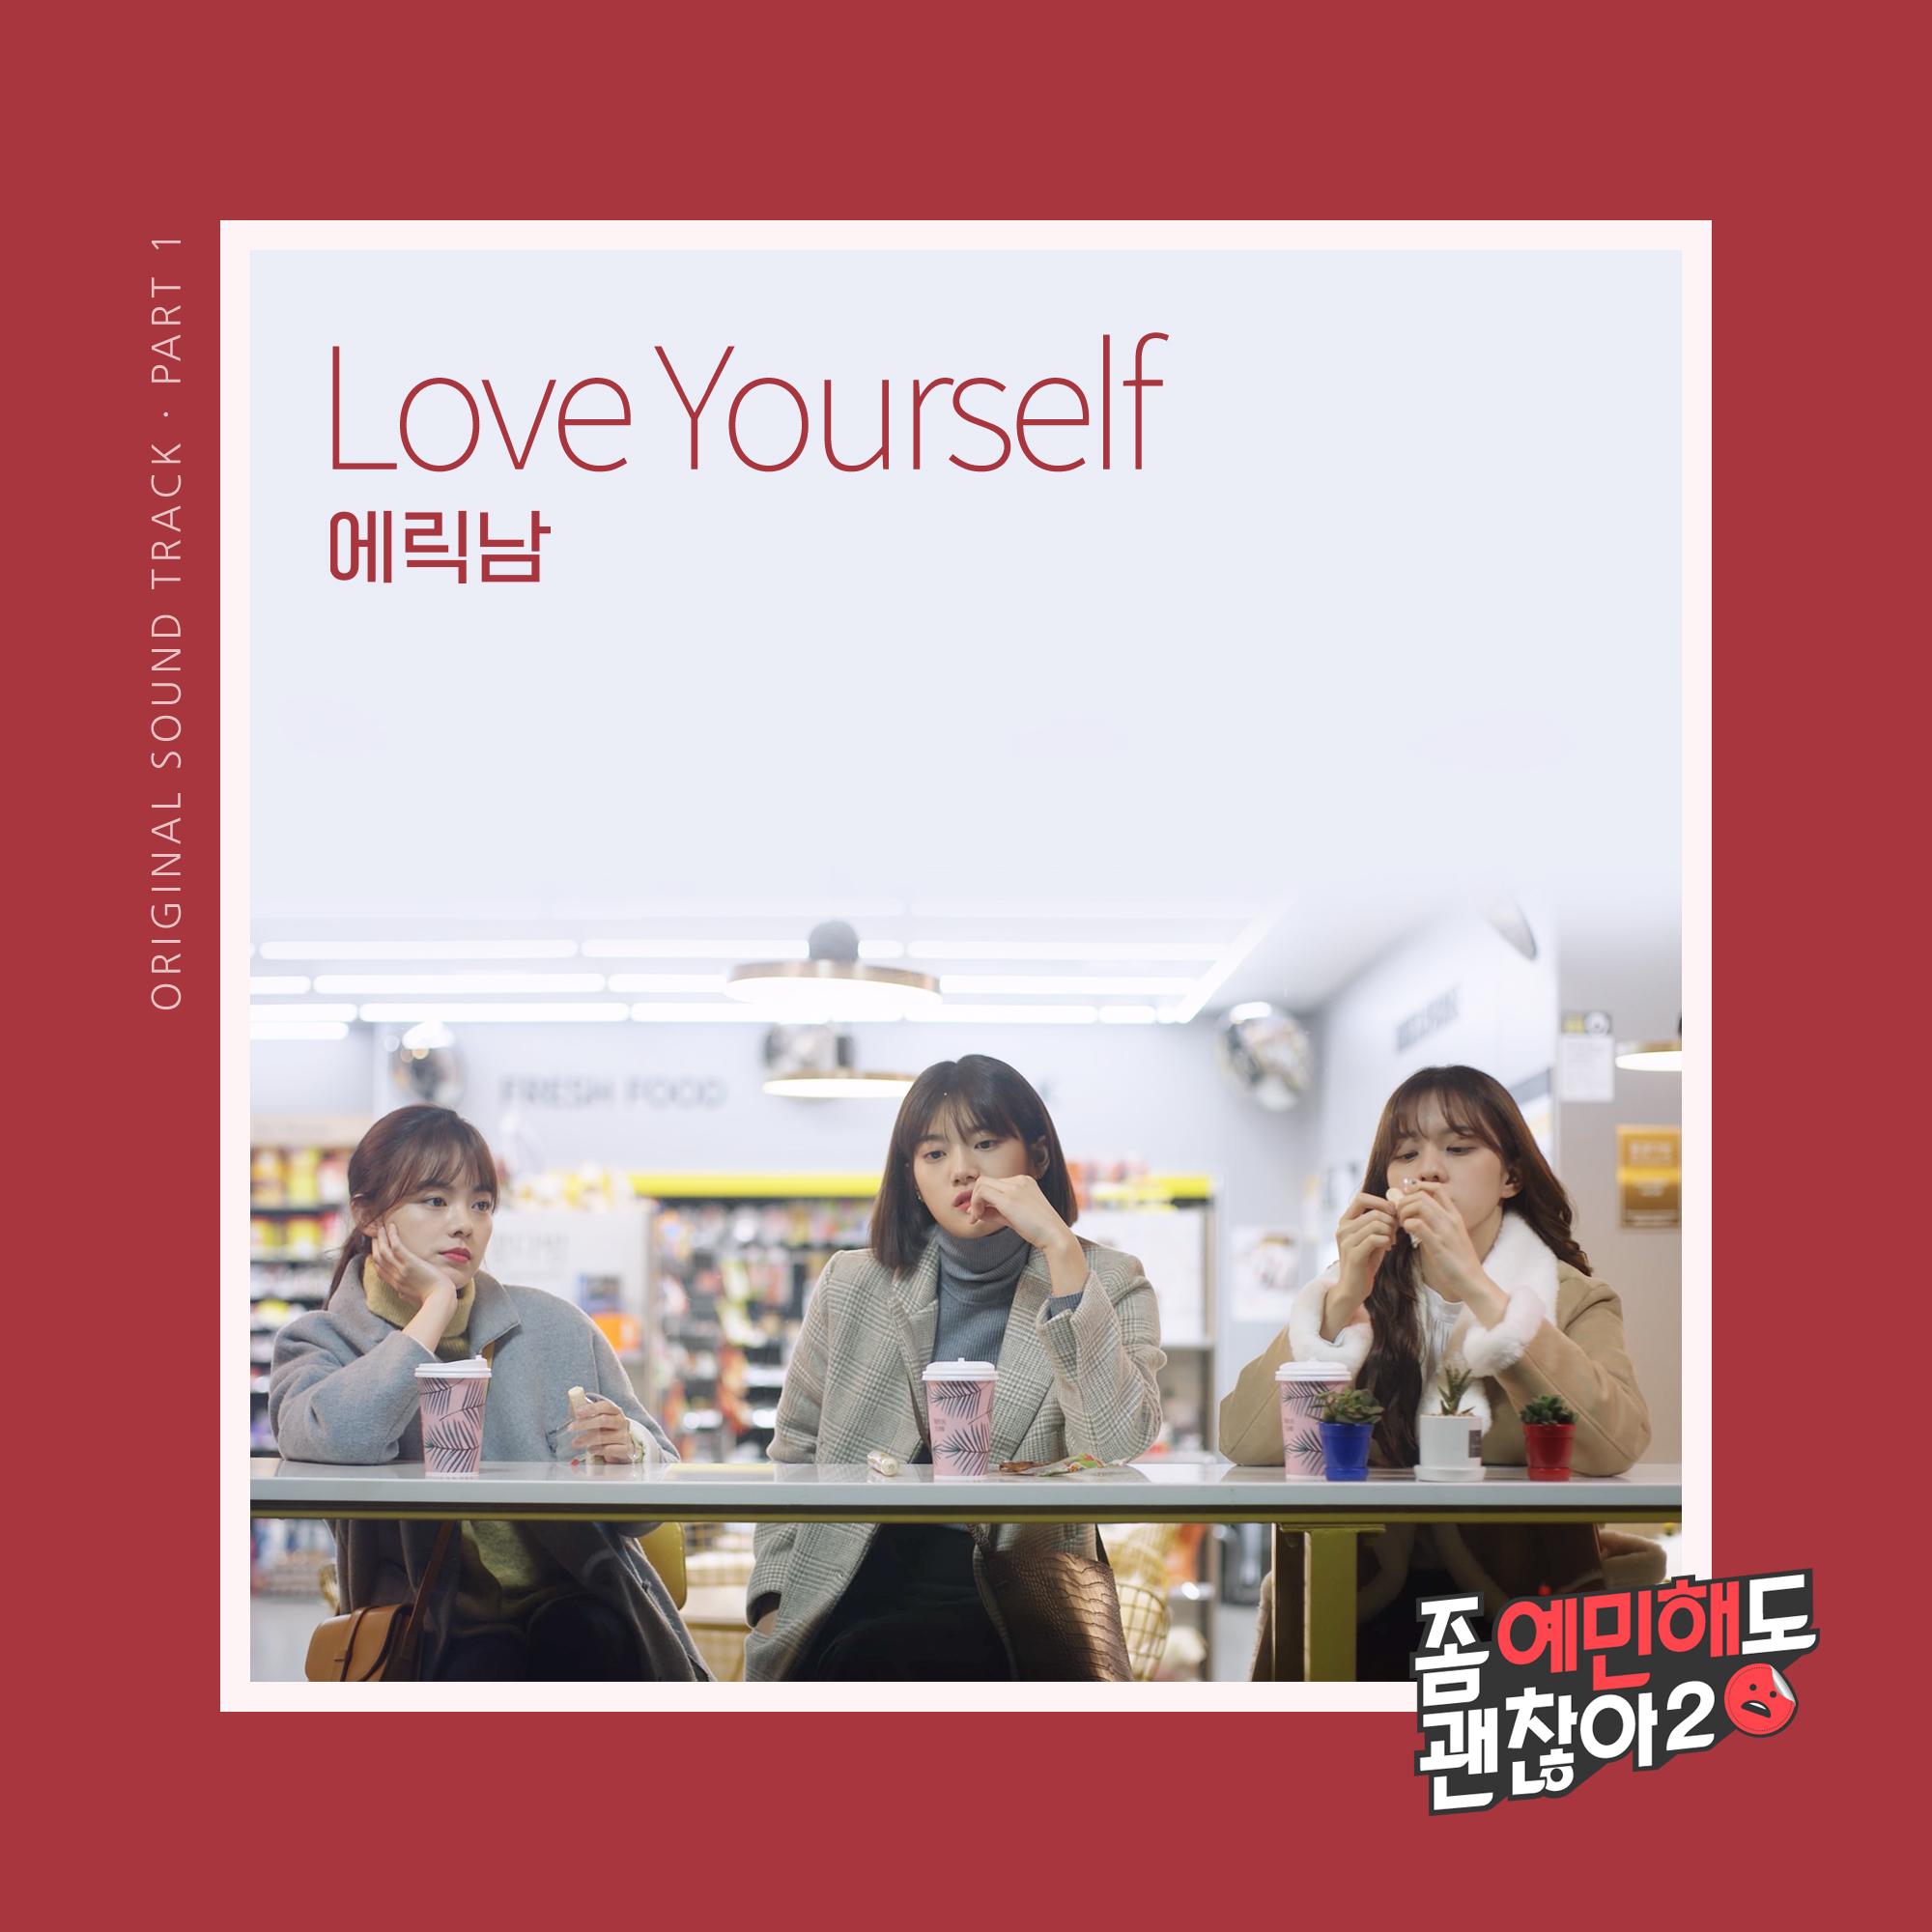 Love your self-에릭남 - Client: tvN D아티스트: 에릭남(Eric Nam)작사: 조윤경 / 작곡,편곡: 진바이진,NODAY, DAWN기획: 스페이스오디티